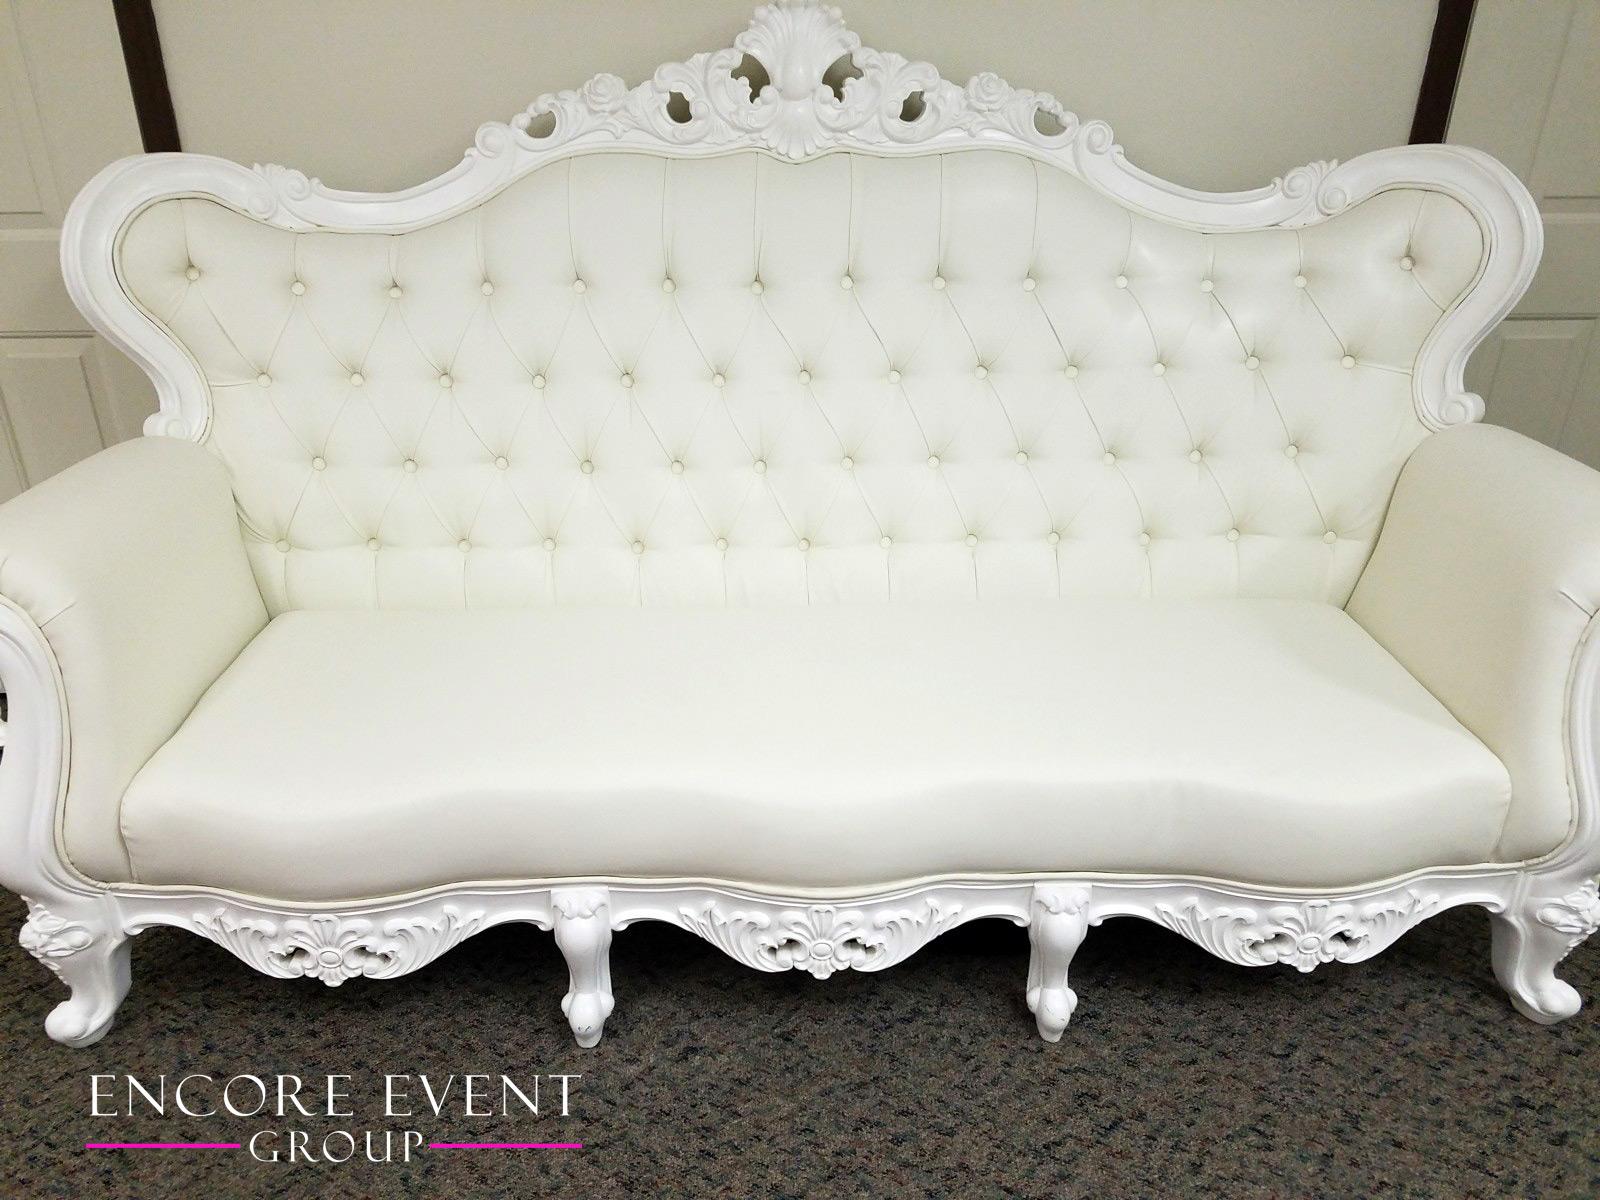 Michigan White Lounge Furniture Rentals Couches